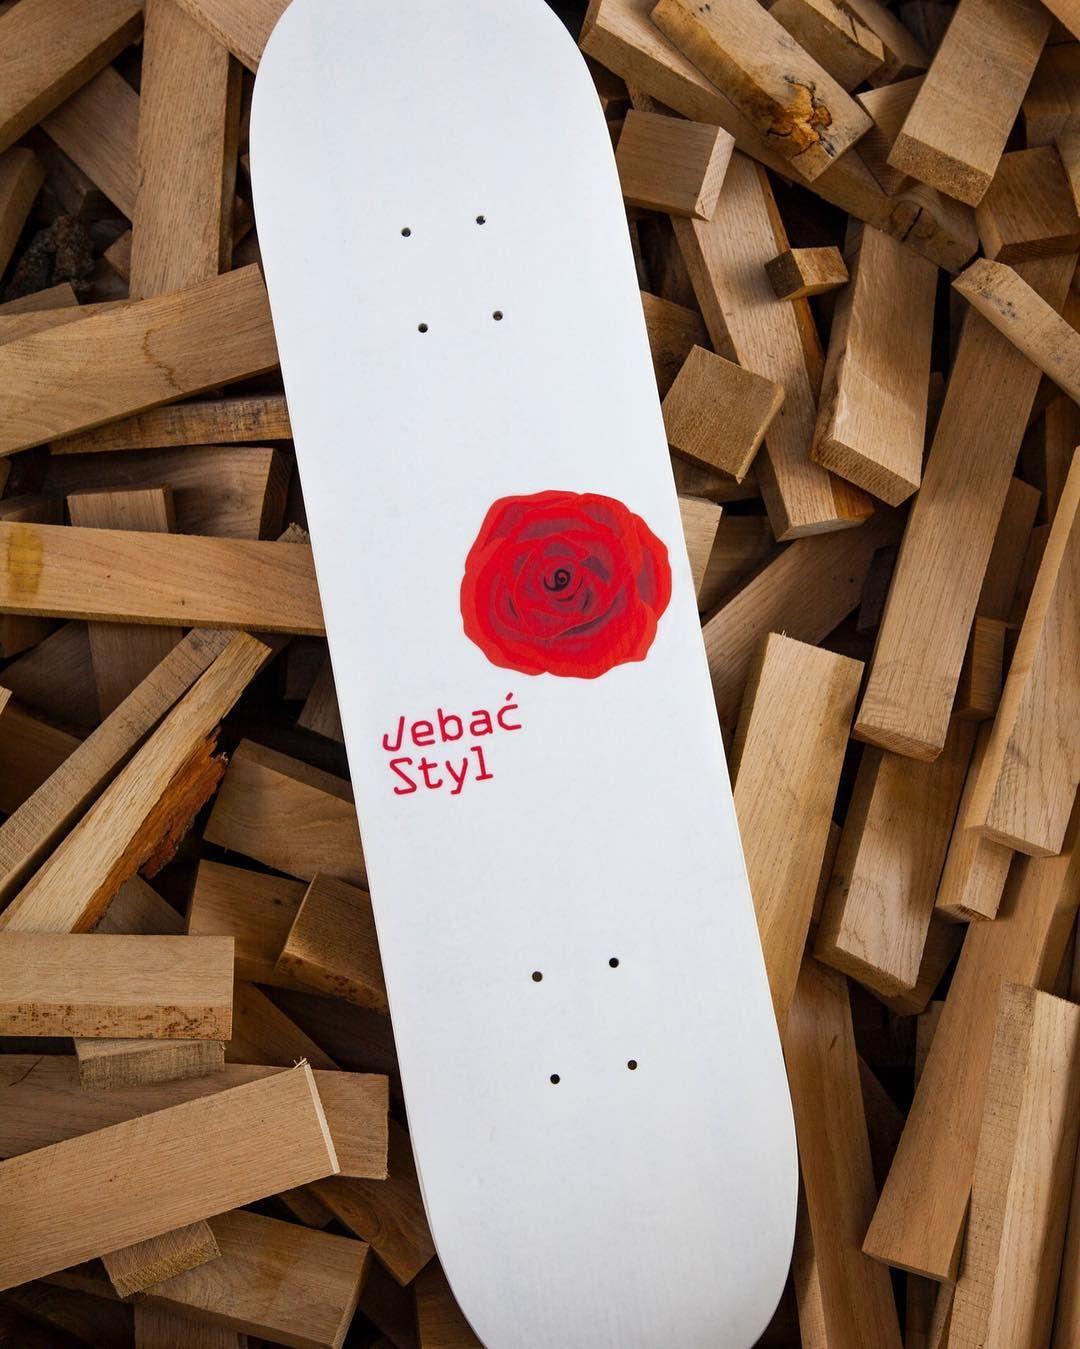 Instagram #skateboarding photo by @mrozekworkshop - NEW STUFF / JEBAĆ STYL / WWW.JEBACSTYL.PL #skateboards #skate #skateboarding #skateeverydamnday  #deck #sk8 #ptg #katowice #sk8girl #bangin #benger #design #mrozekworkshop. Support your local skate shop: SkateboardCity.co